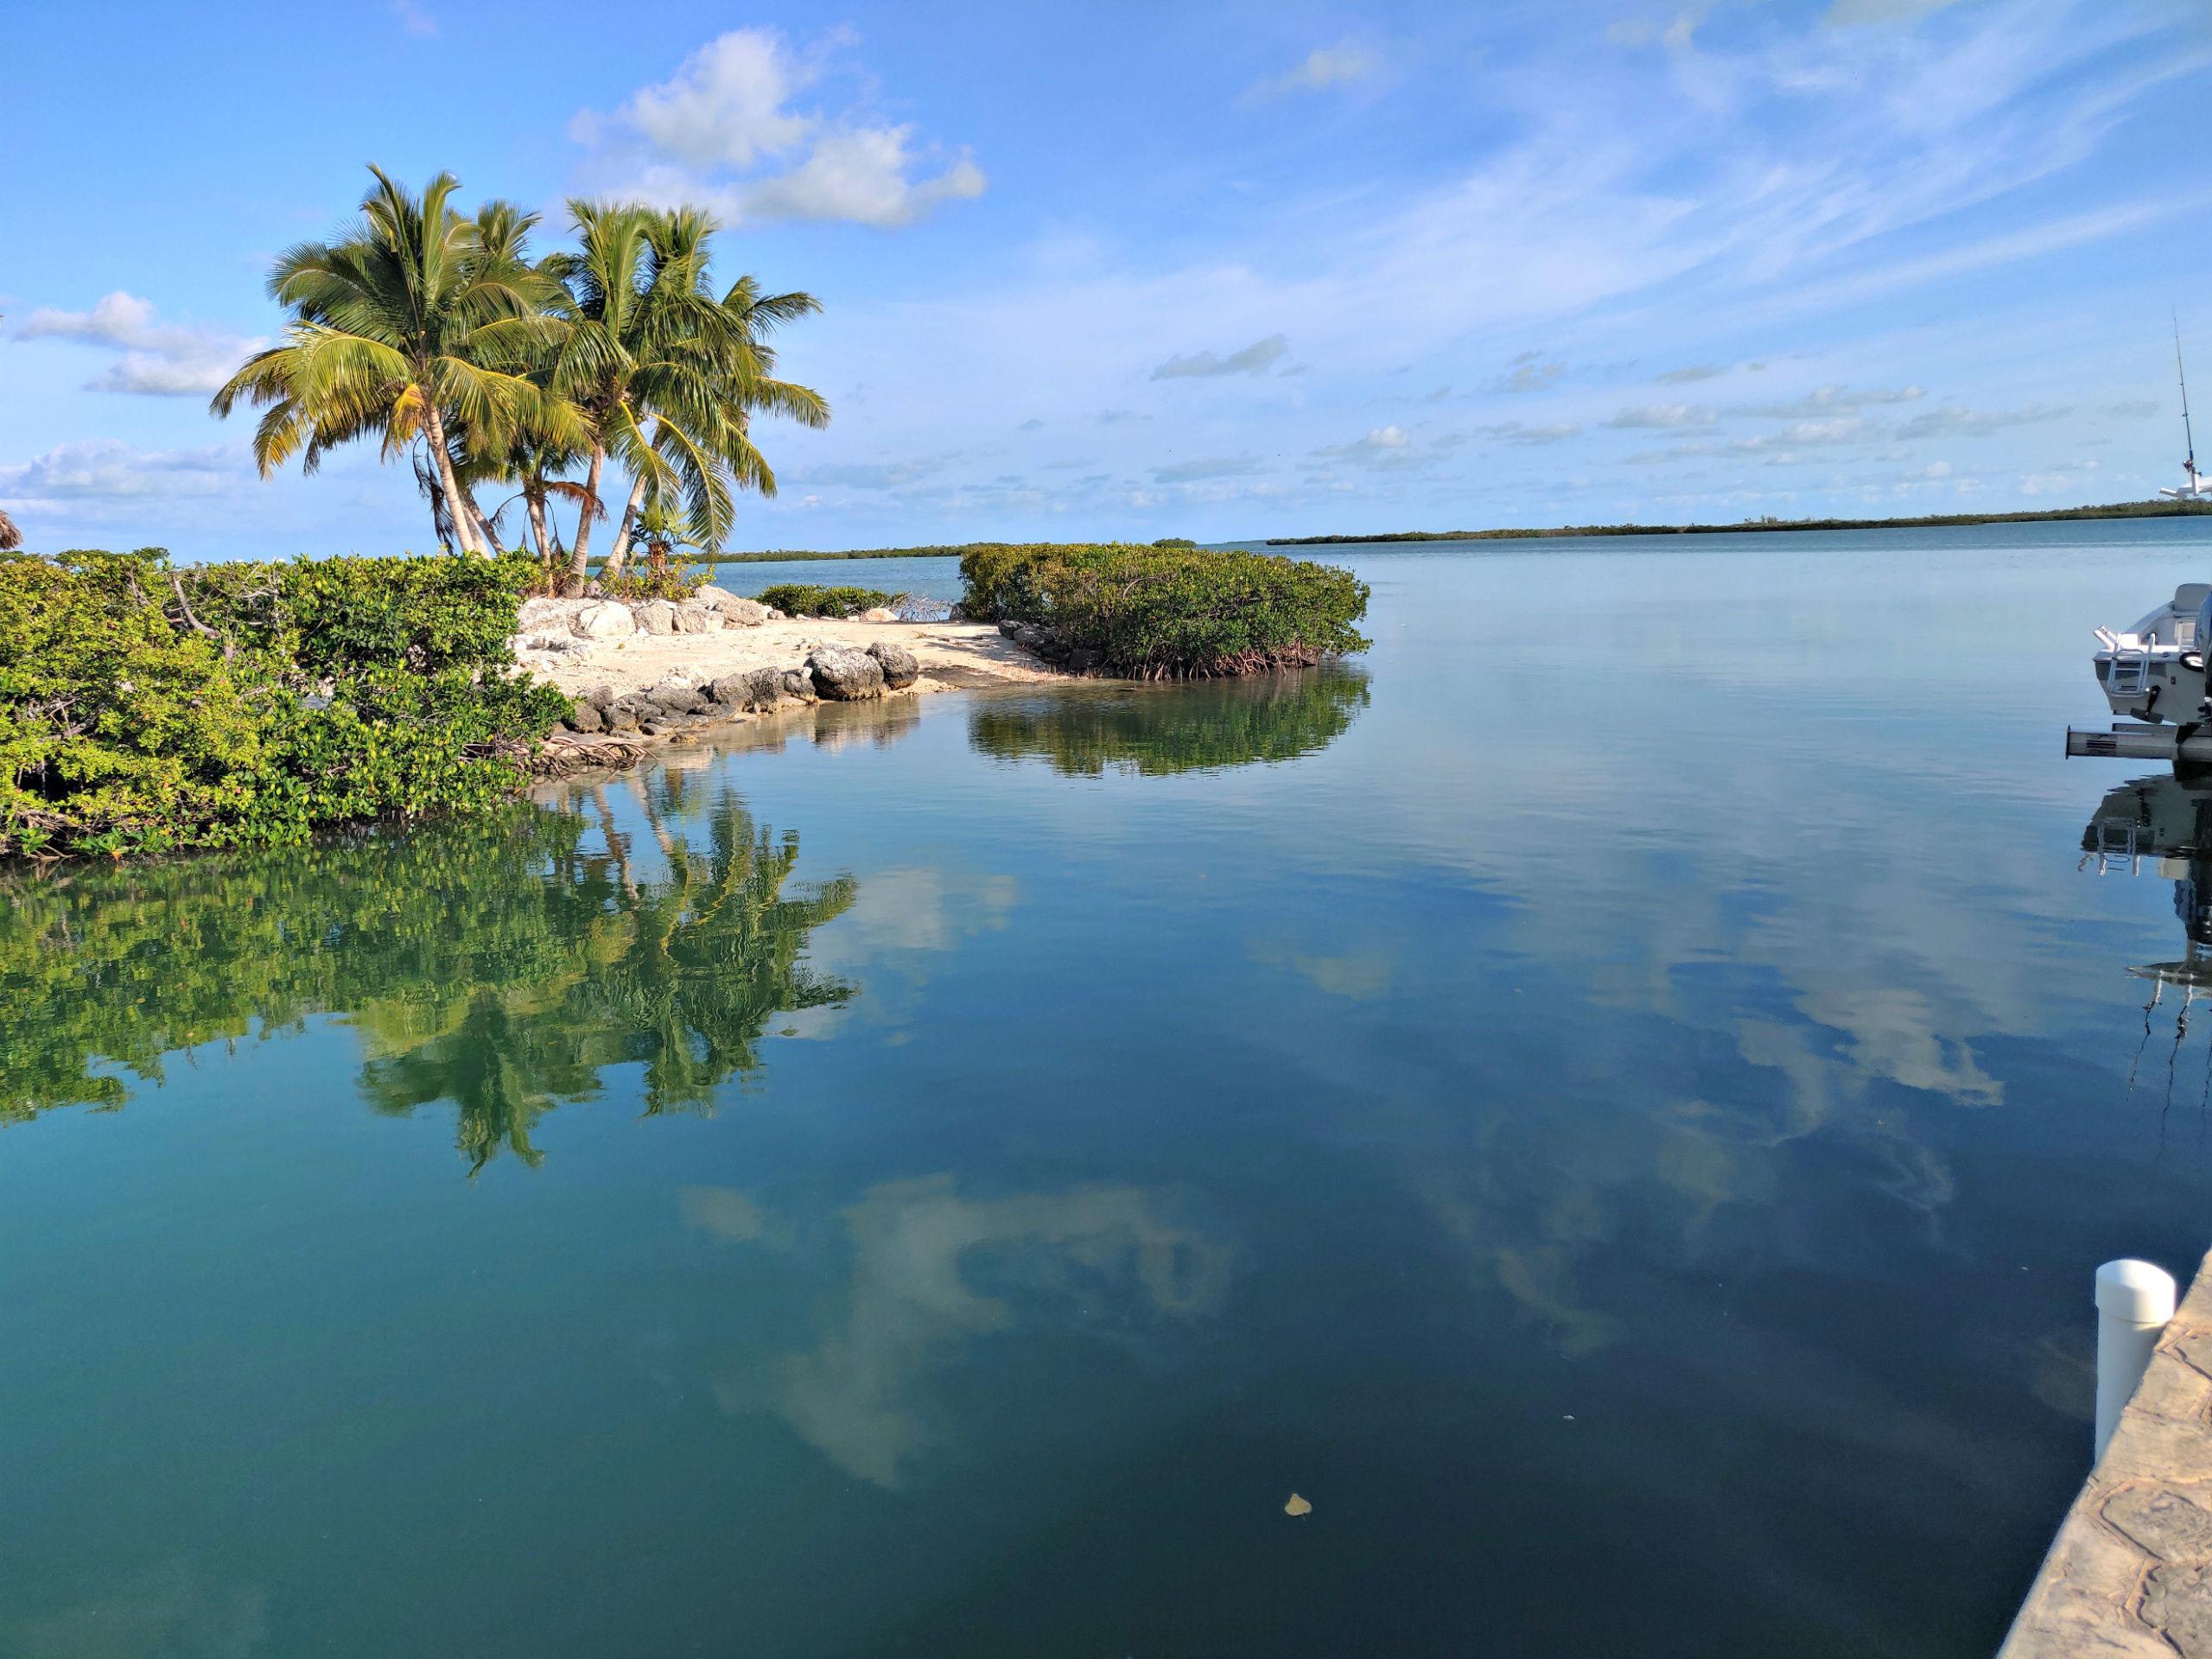 Open Water View - 1 Palmetto Dr., Big Coppitt